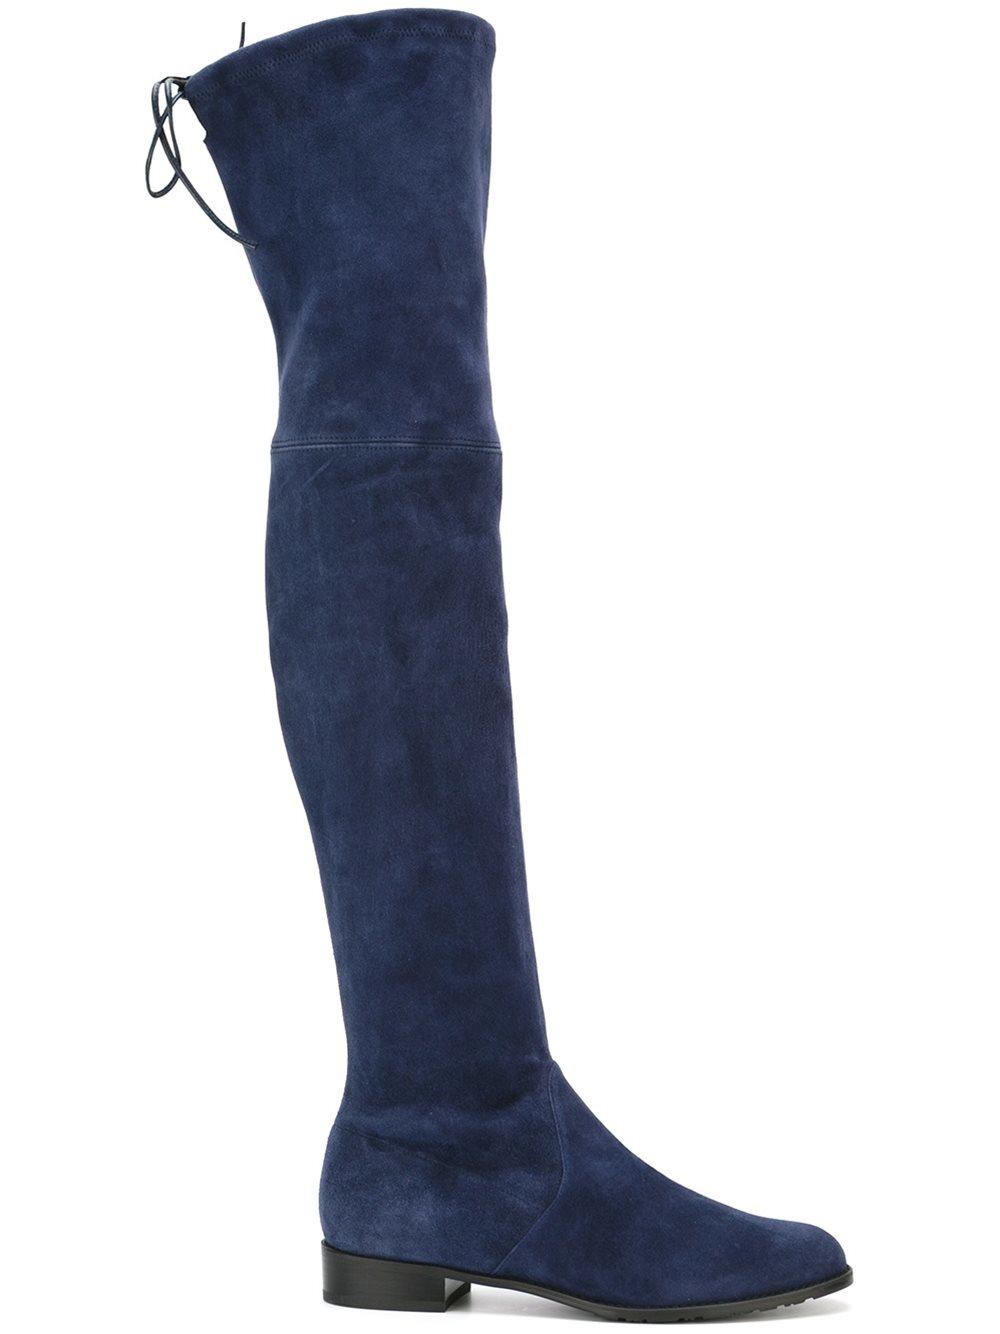 stuart weitzman the knee suede boots in blue lyst